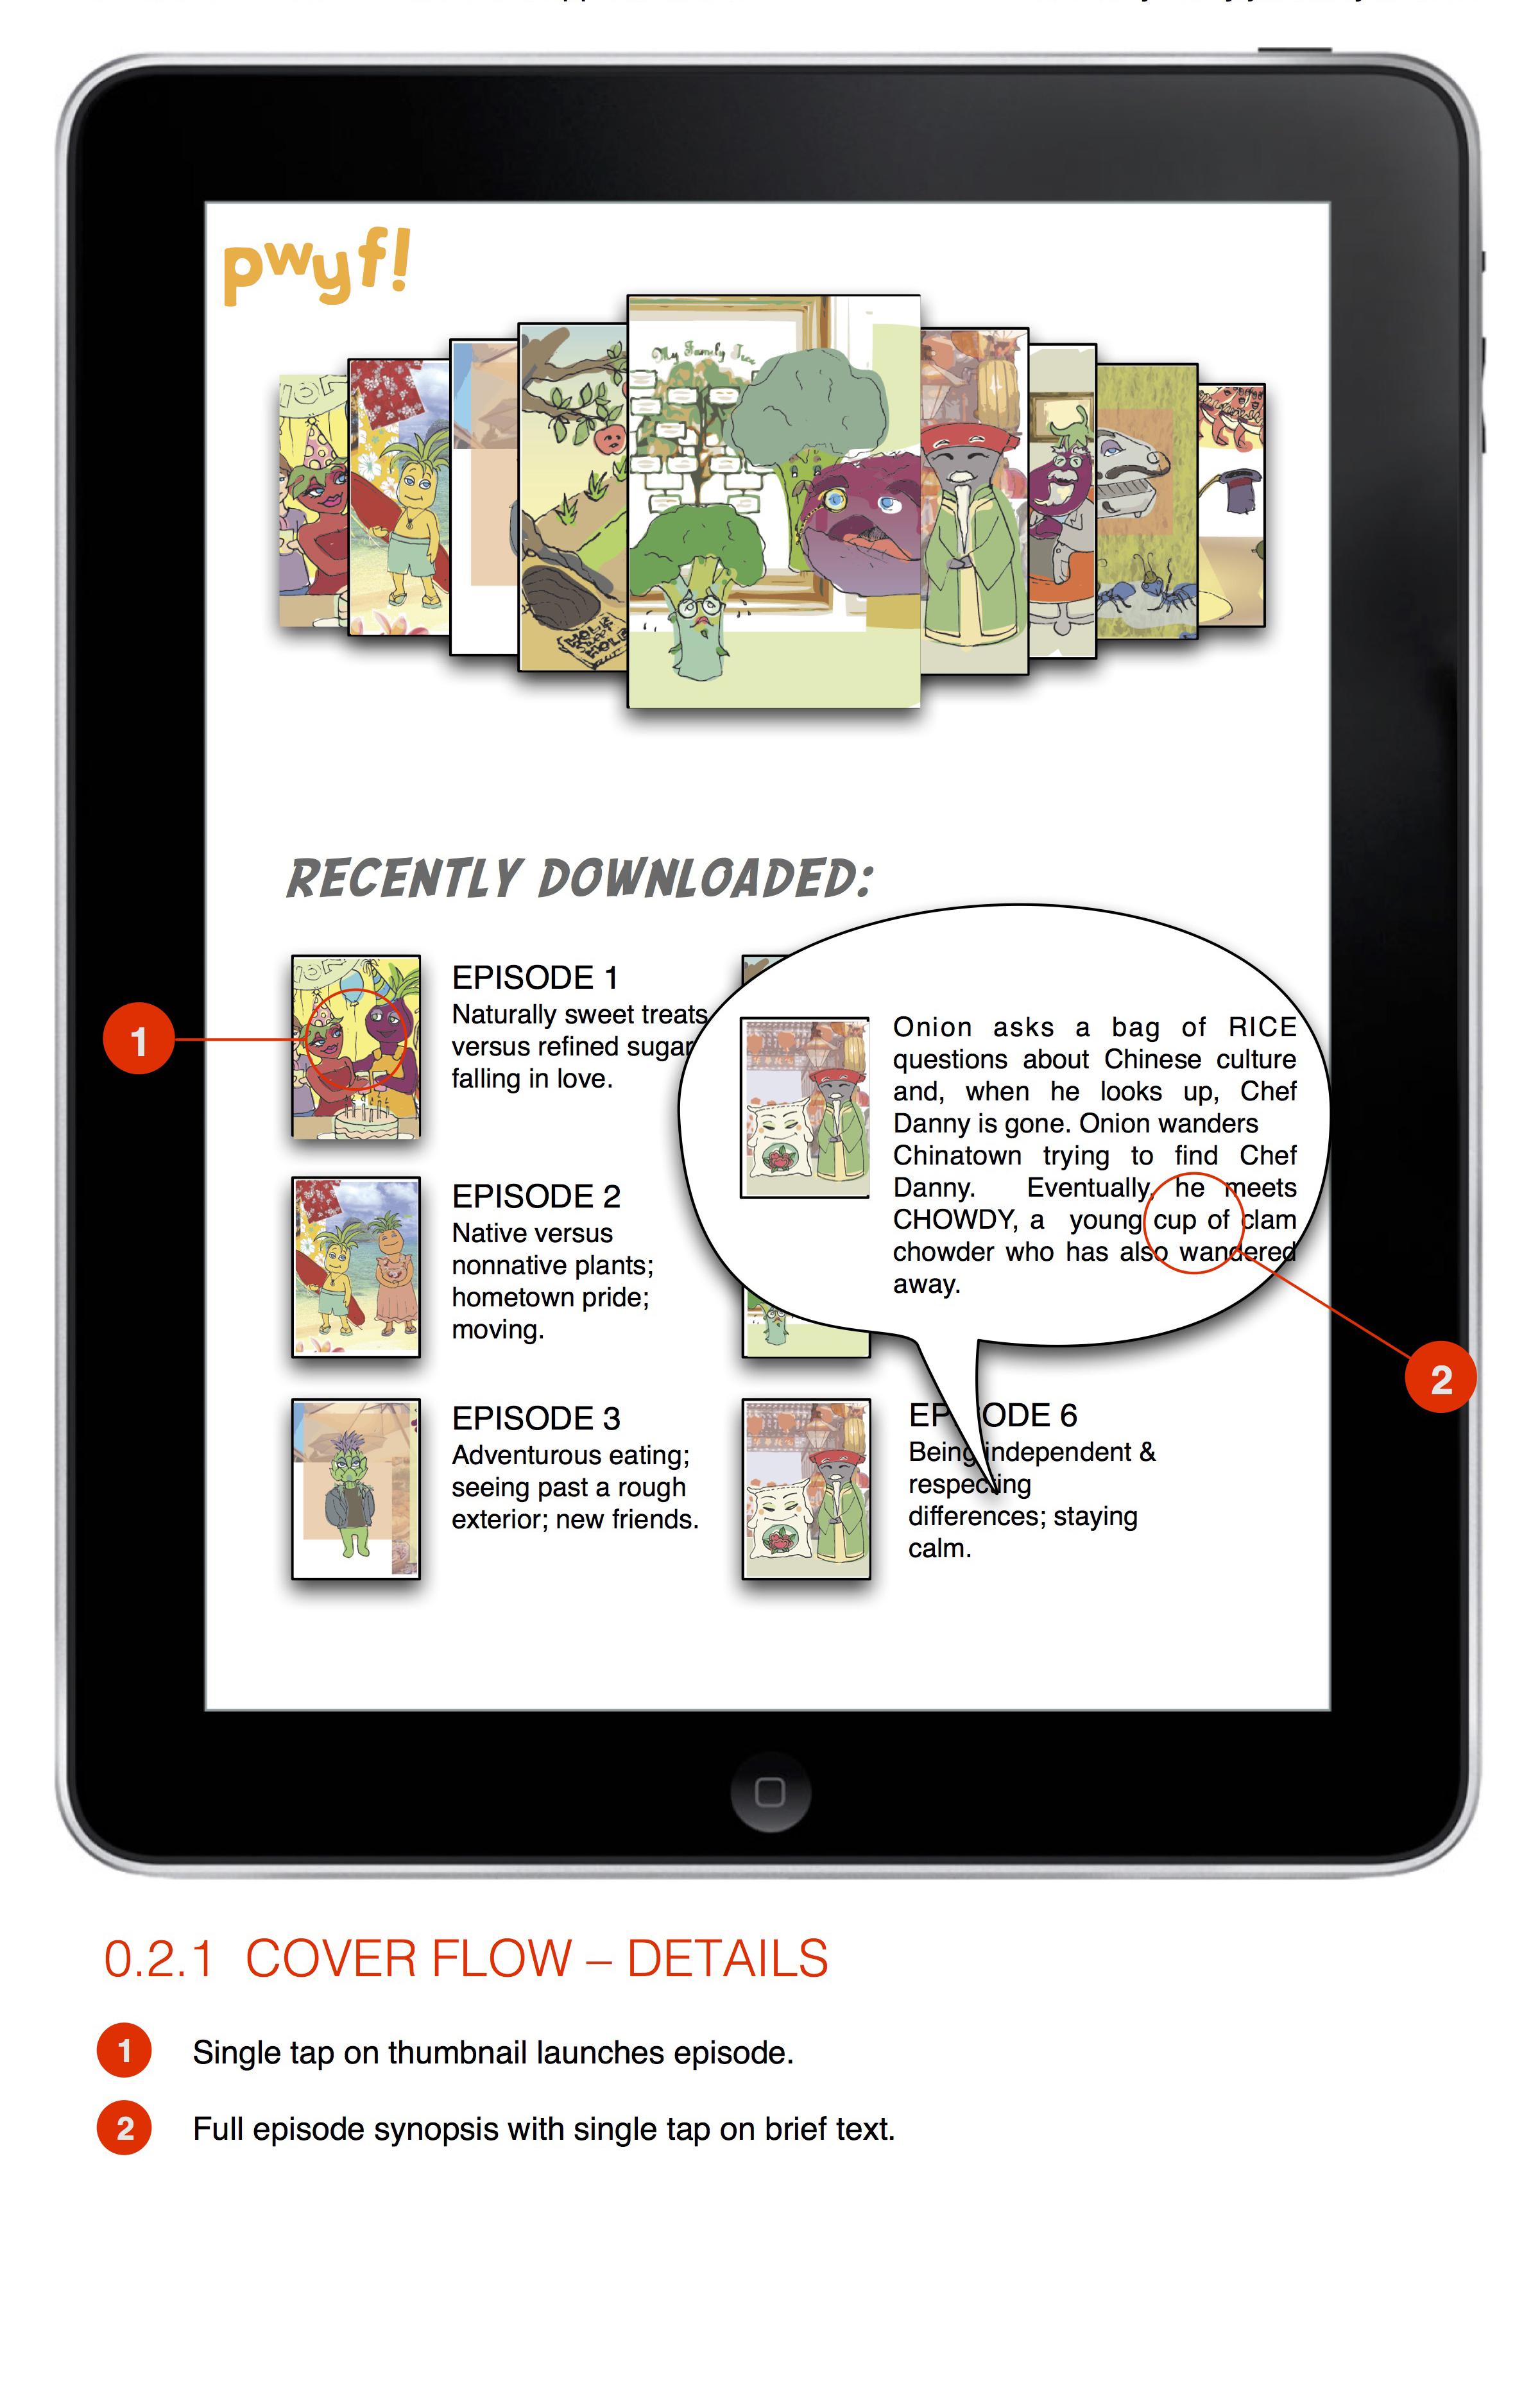 PWYF!_iPadApp_wireframes_large.2.jpg